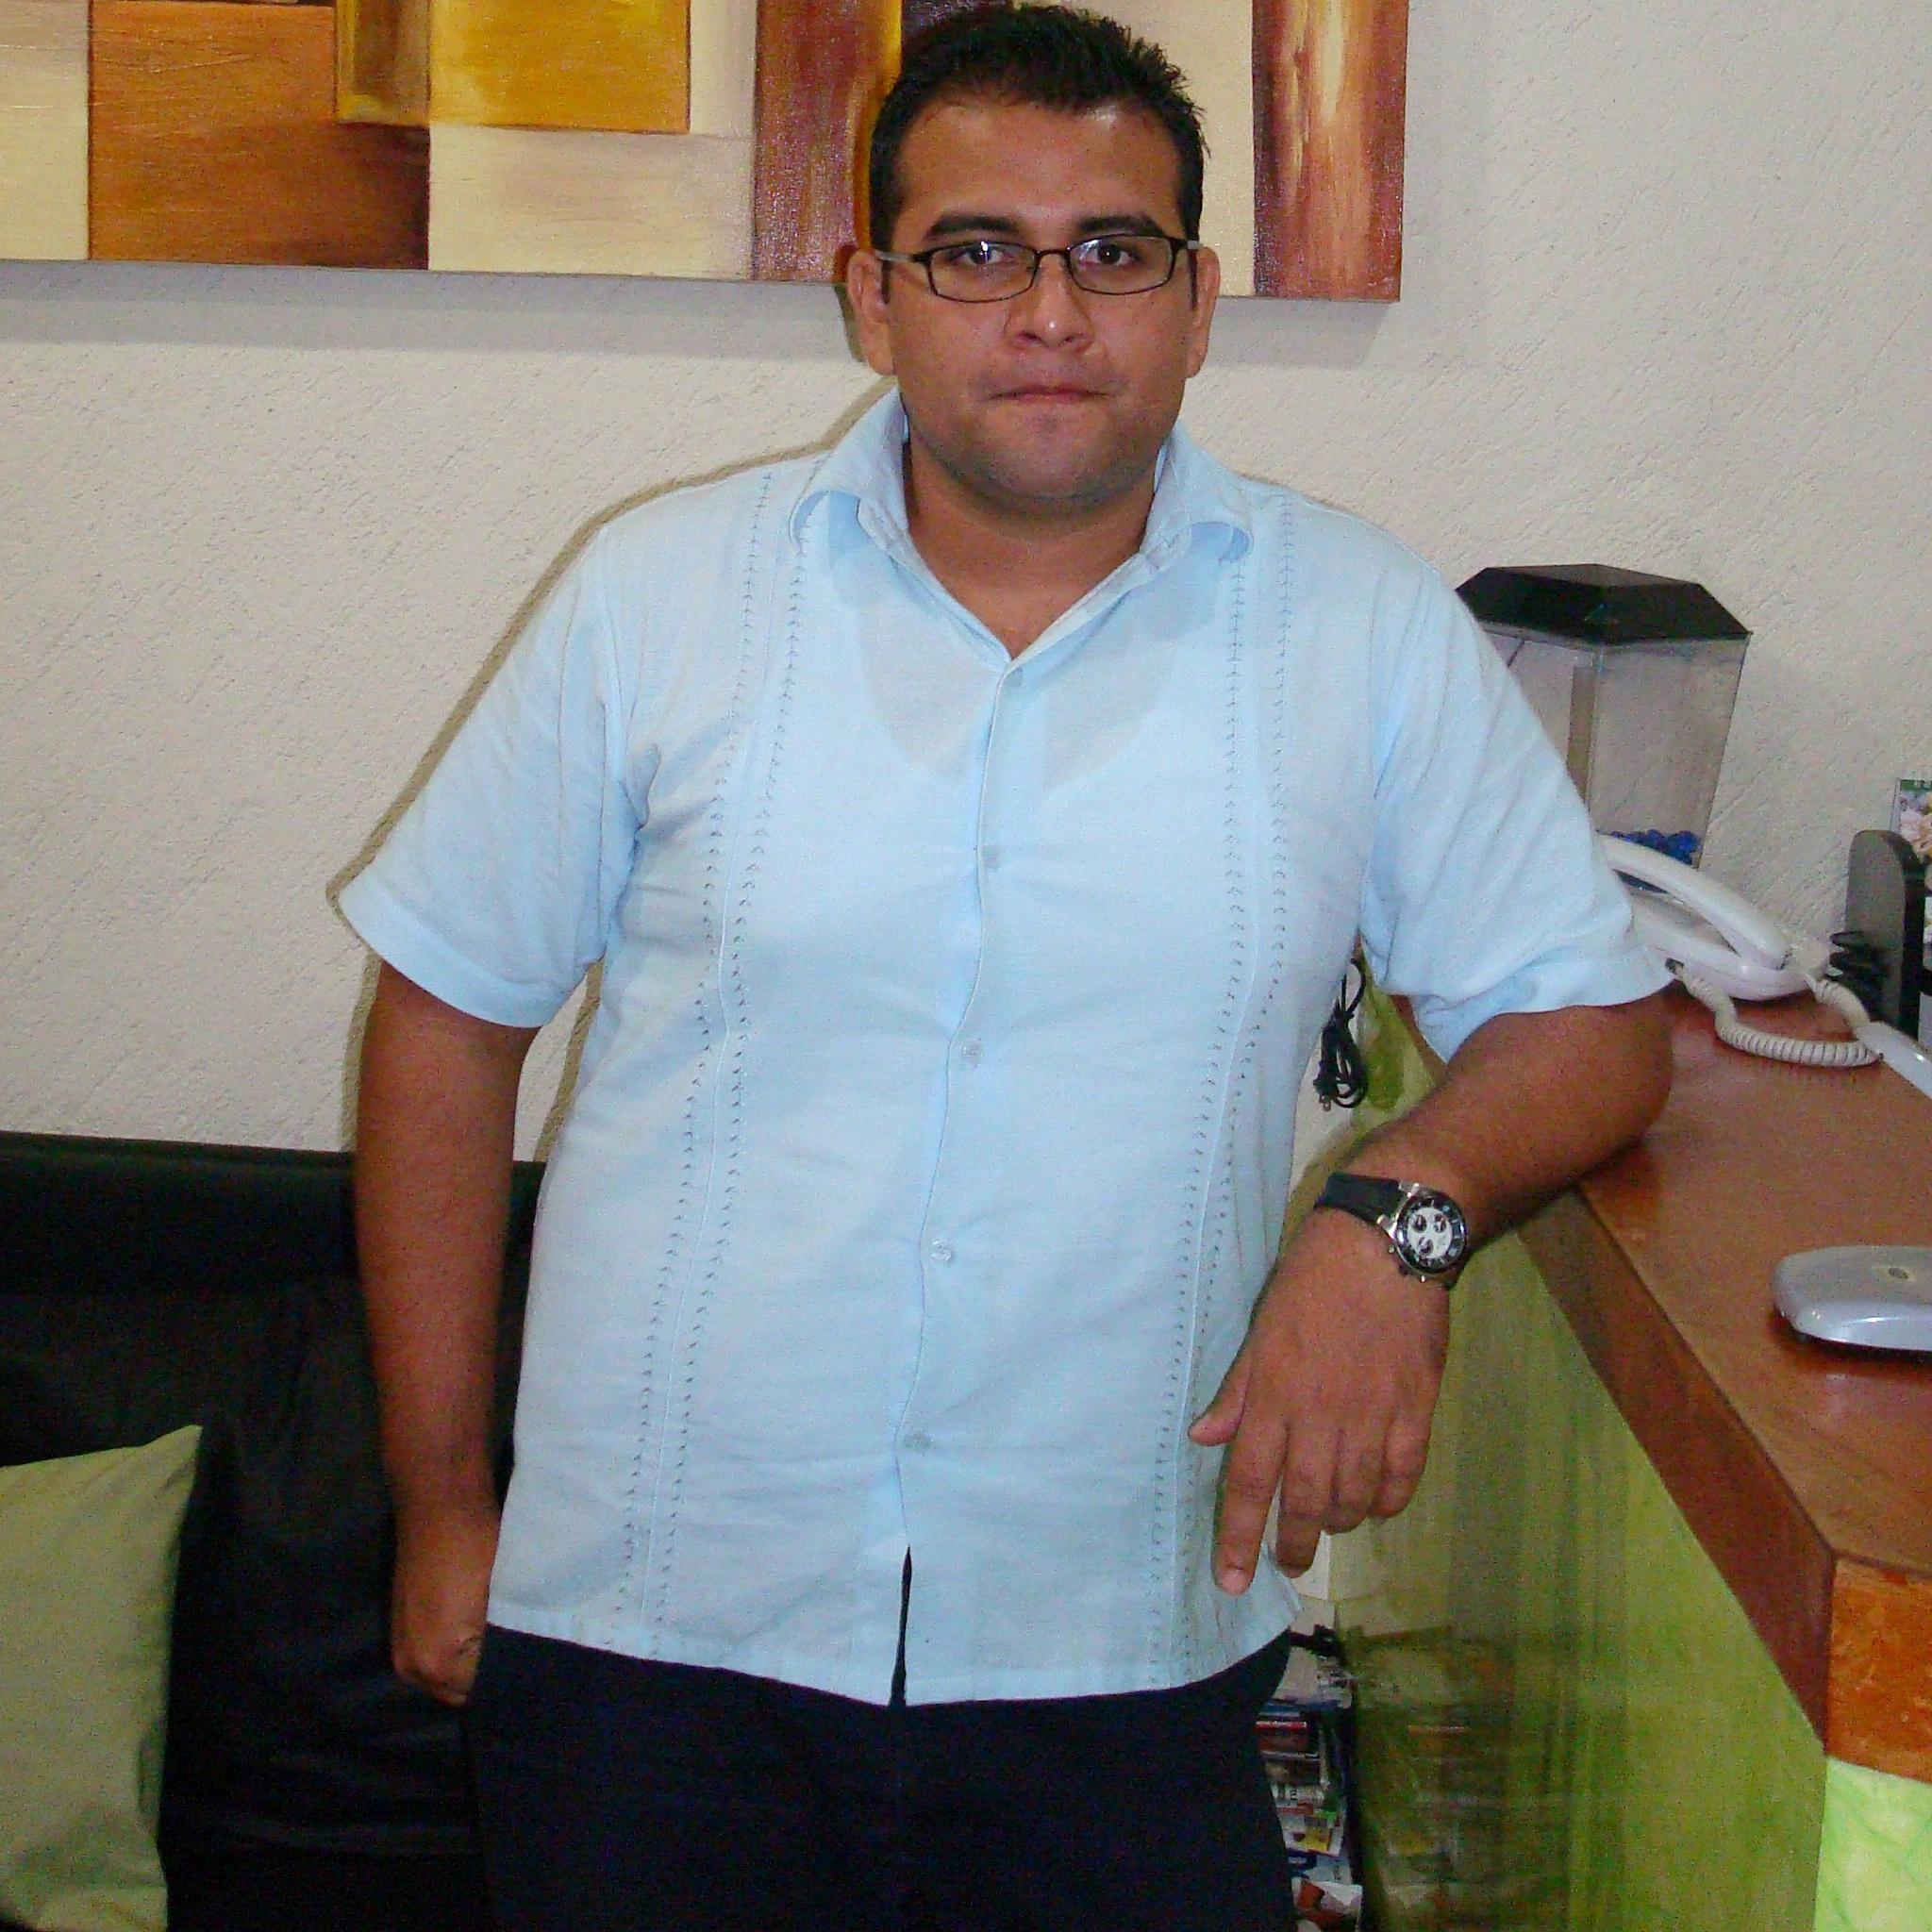 Luis Josué Parra Adam